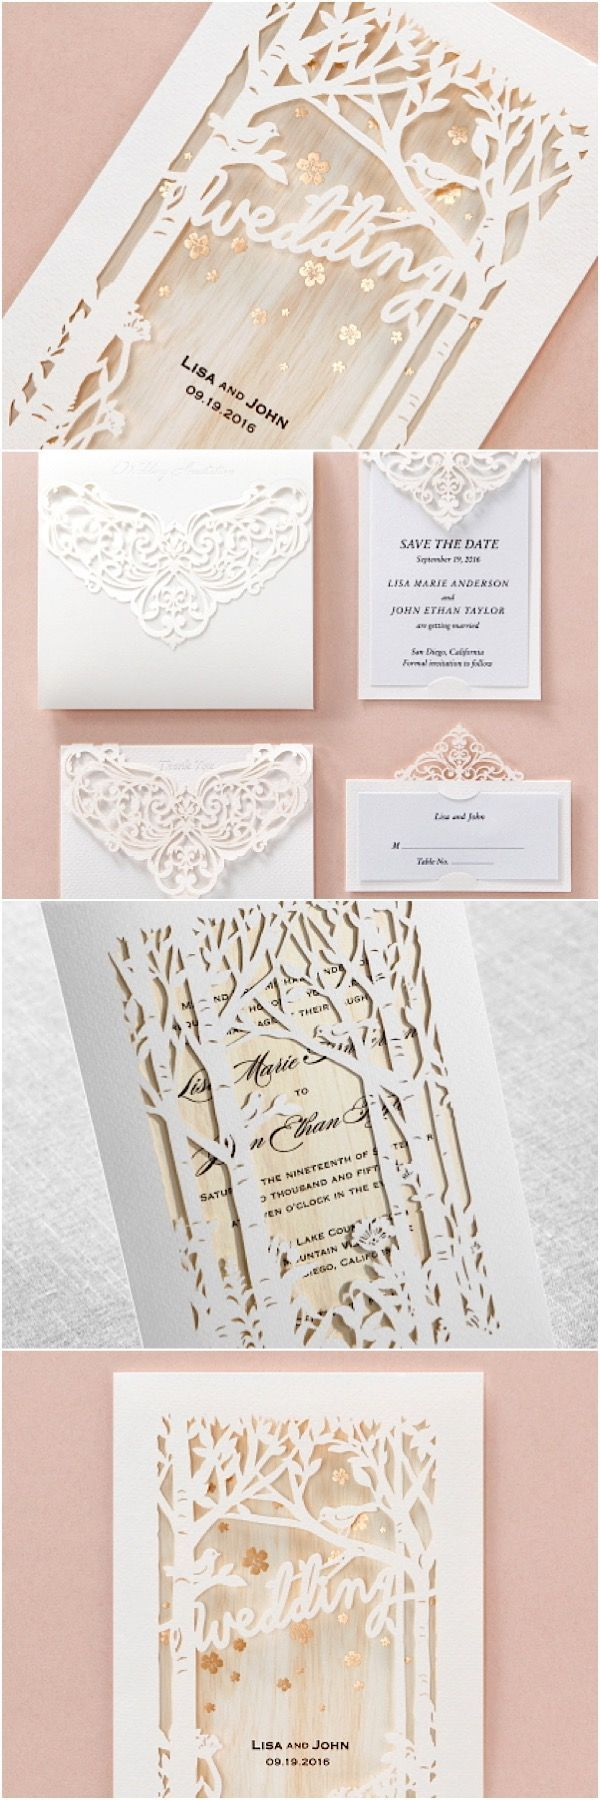 bridal shower invitations registry etiquette%0A Chic and unique wedding invitations from Bweddinginvitations